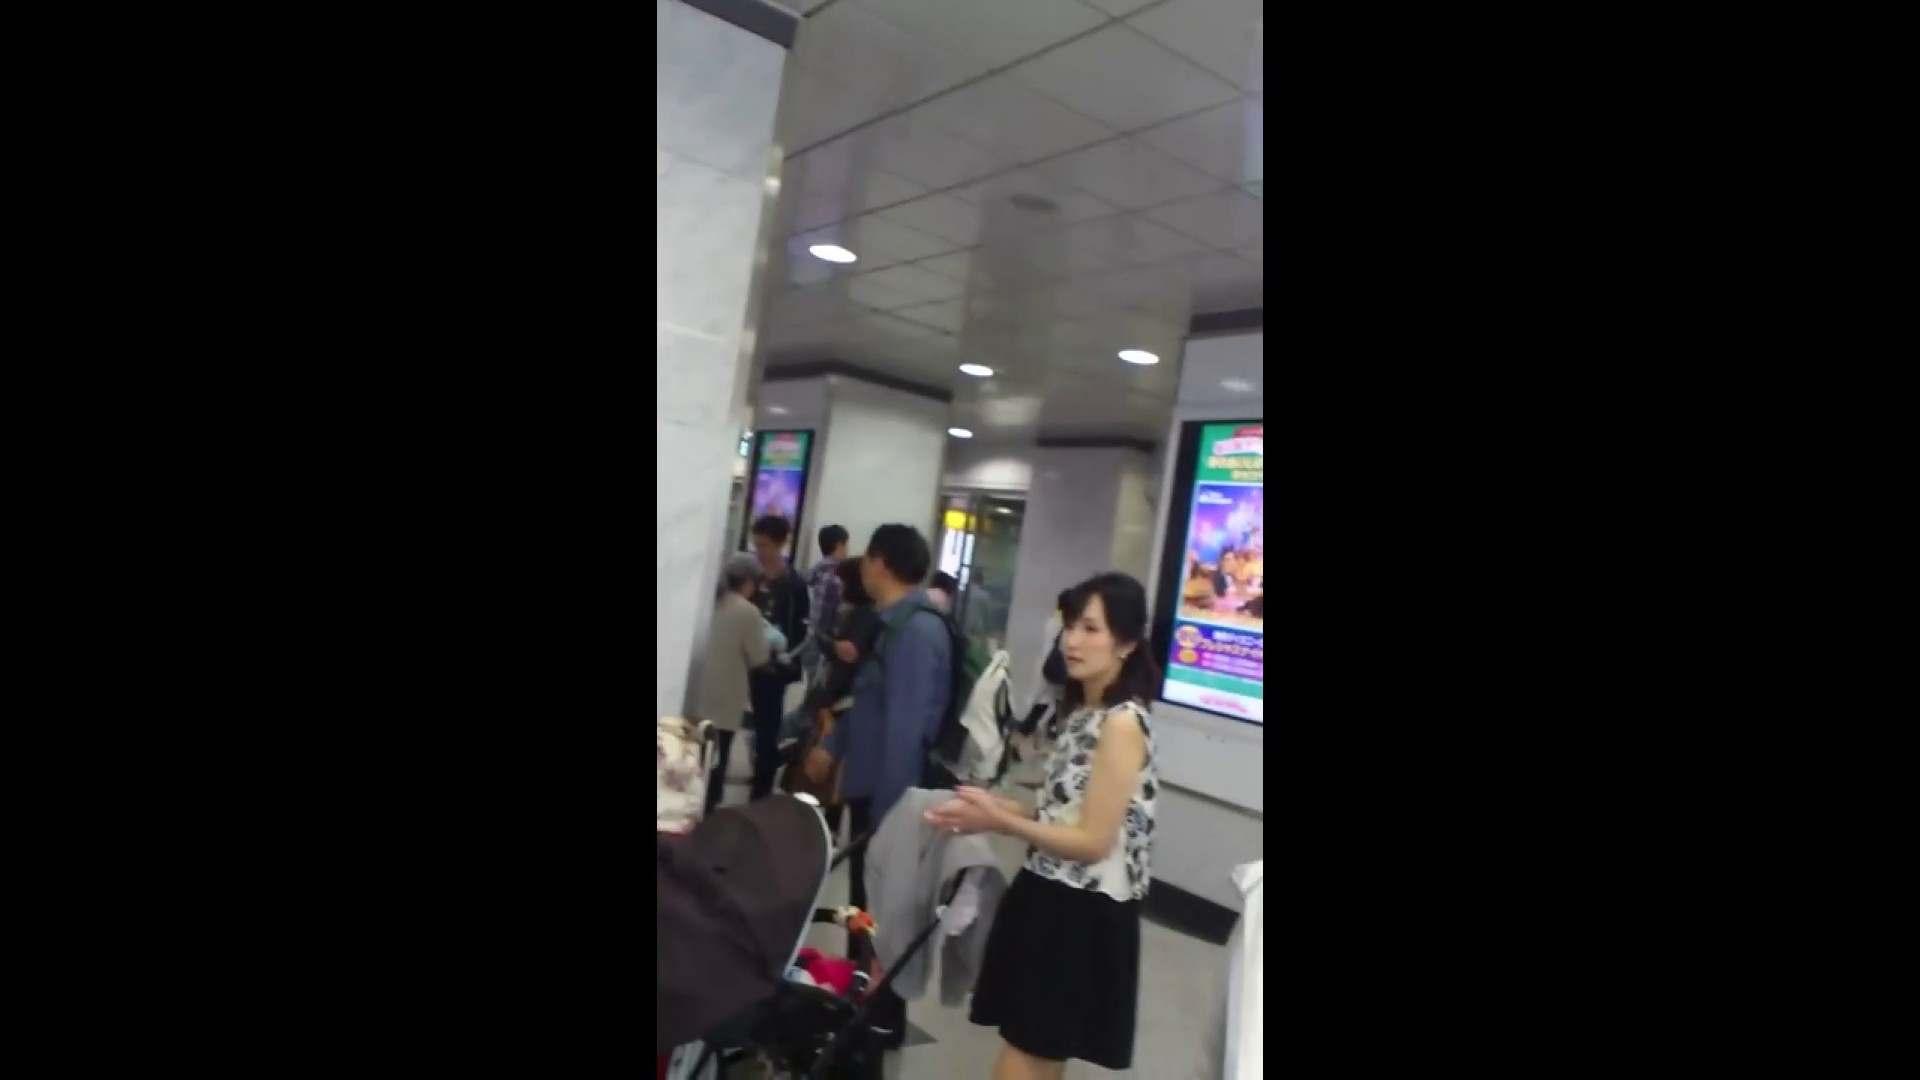 盗撮列車 Vol.56 盗撮 オマンコ無修正動画無料 59PIX 50